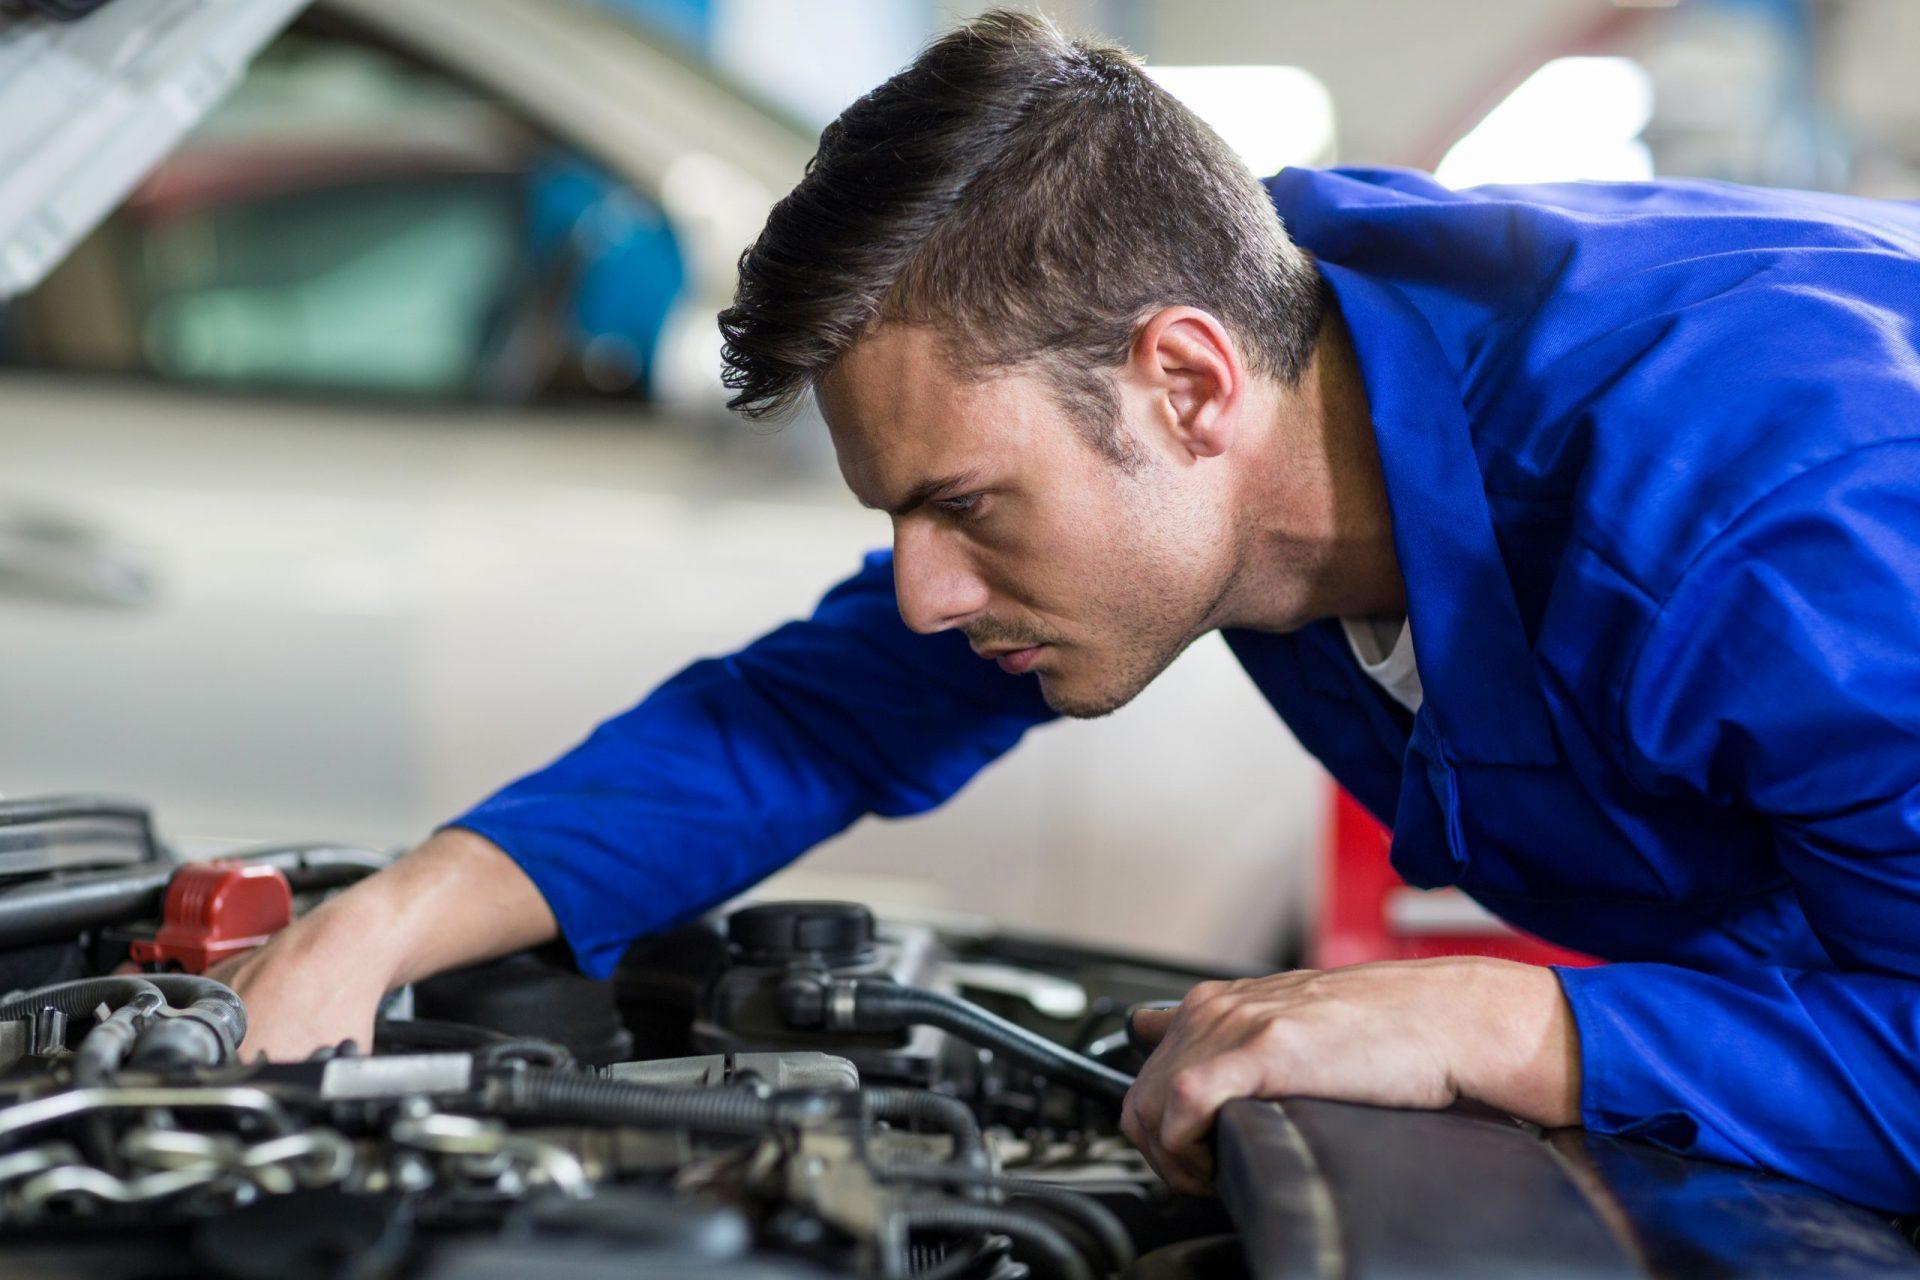 Mecánica y Electromecánica del Automóvil